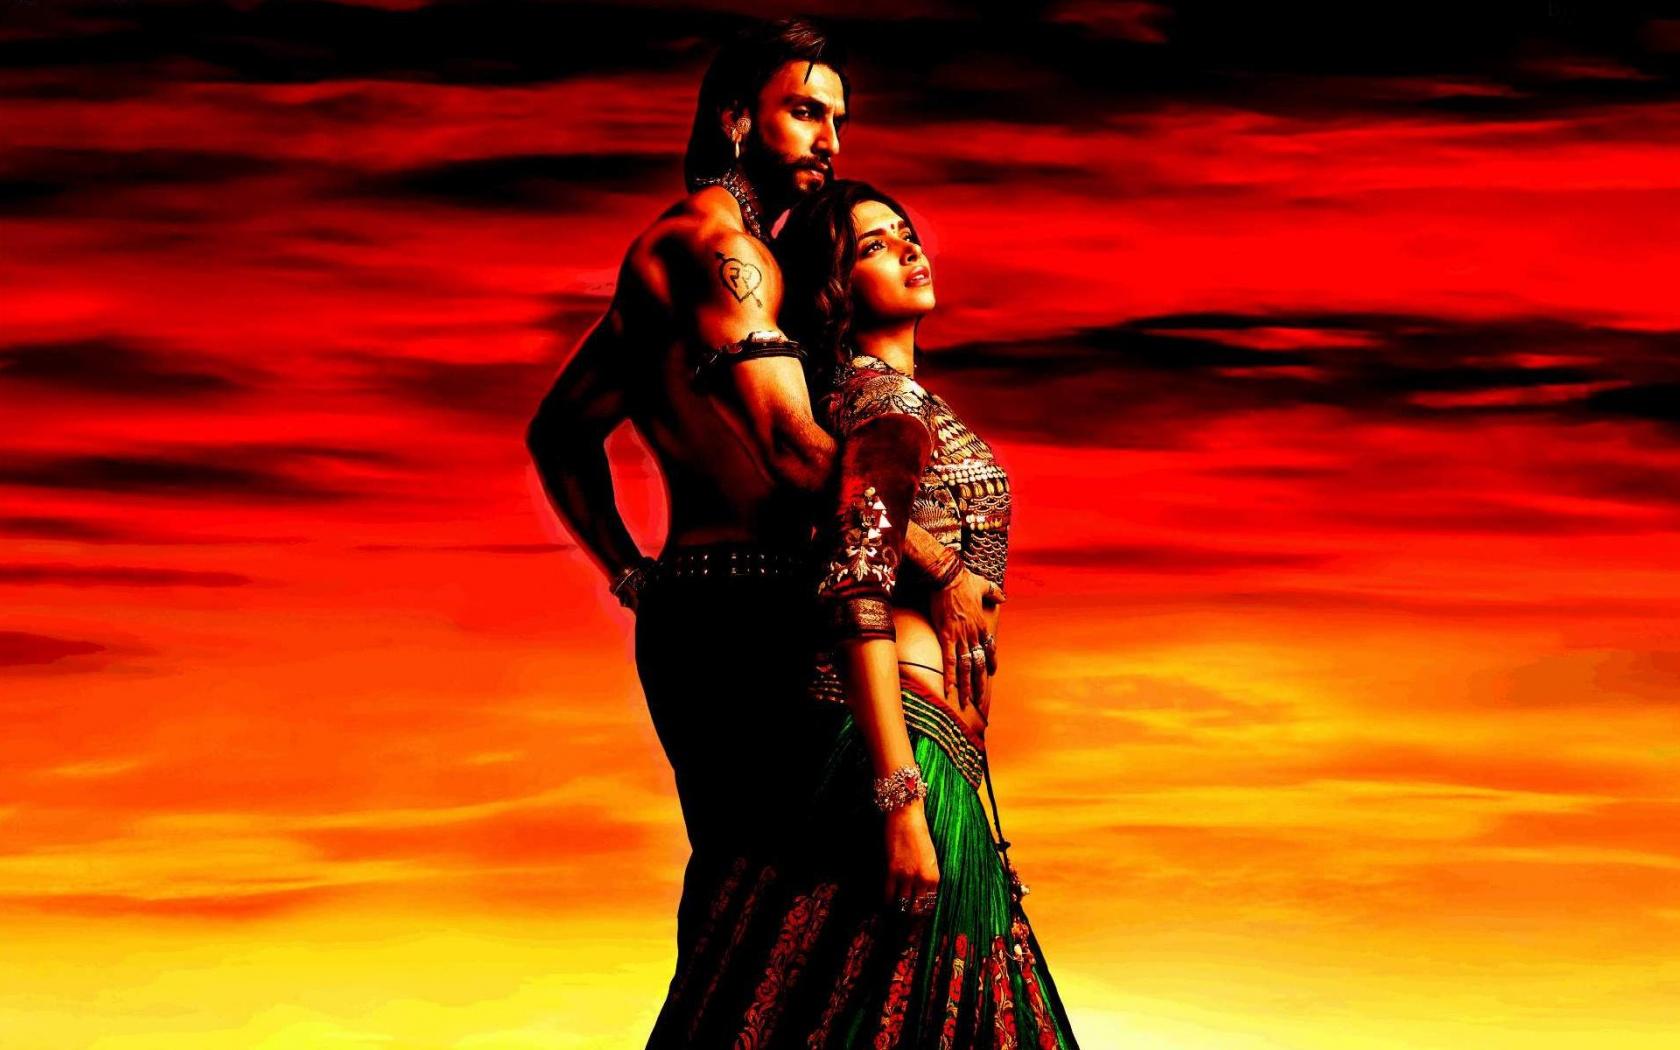 mahogany movie couples images ram leela hd wallpaper and